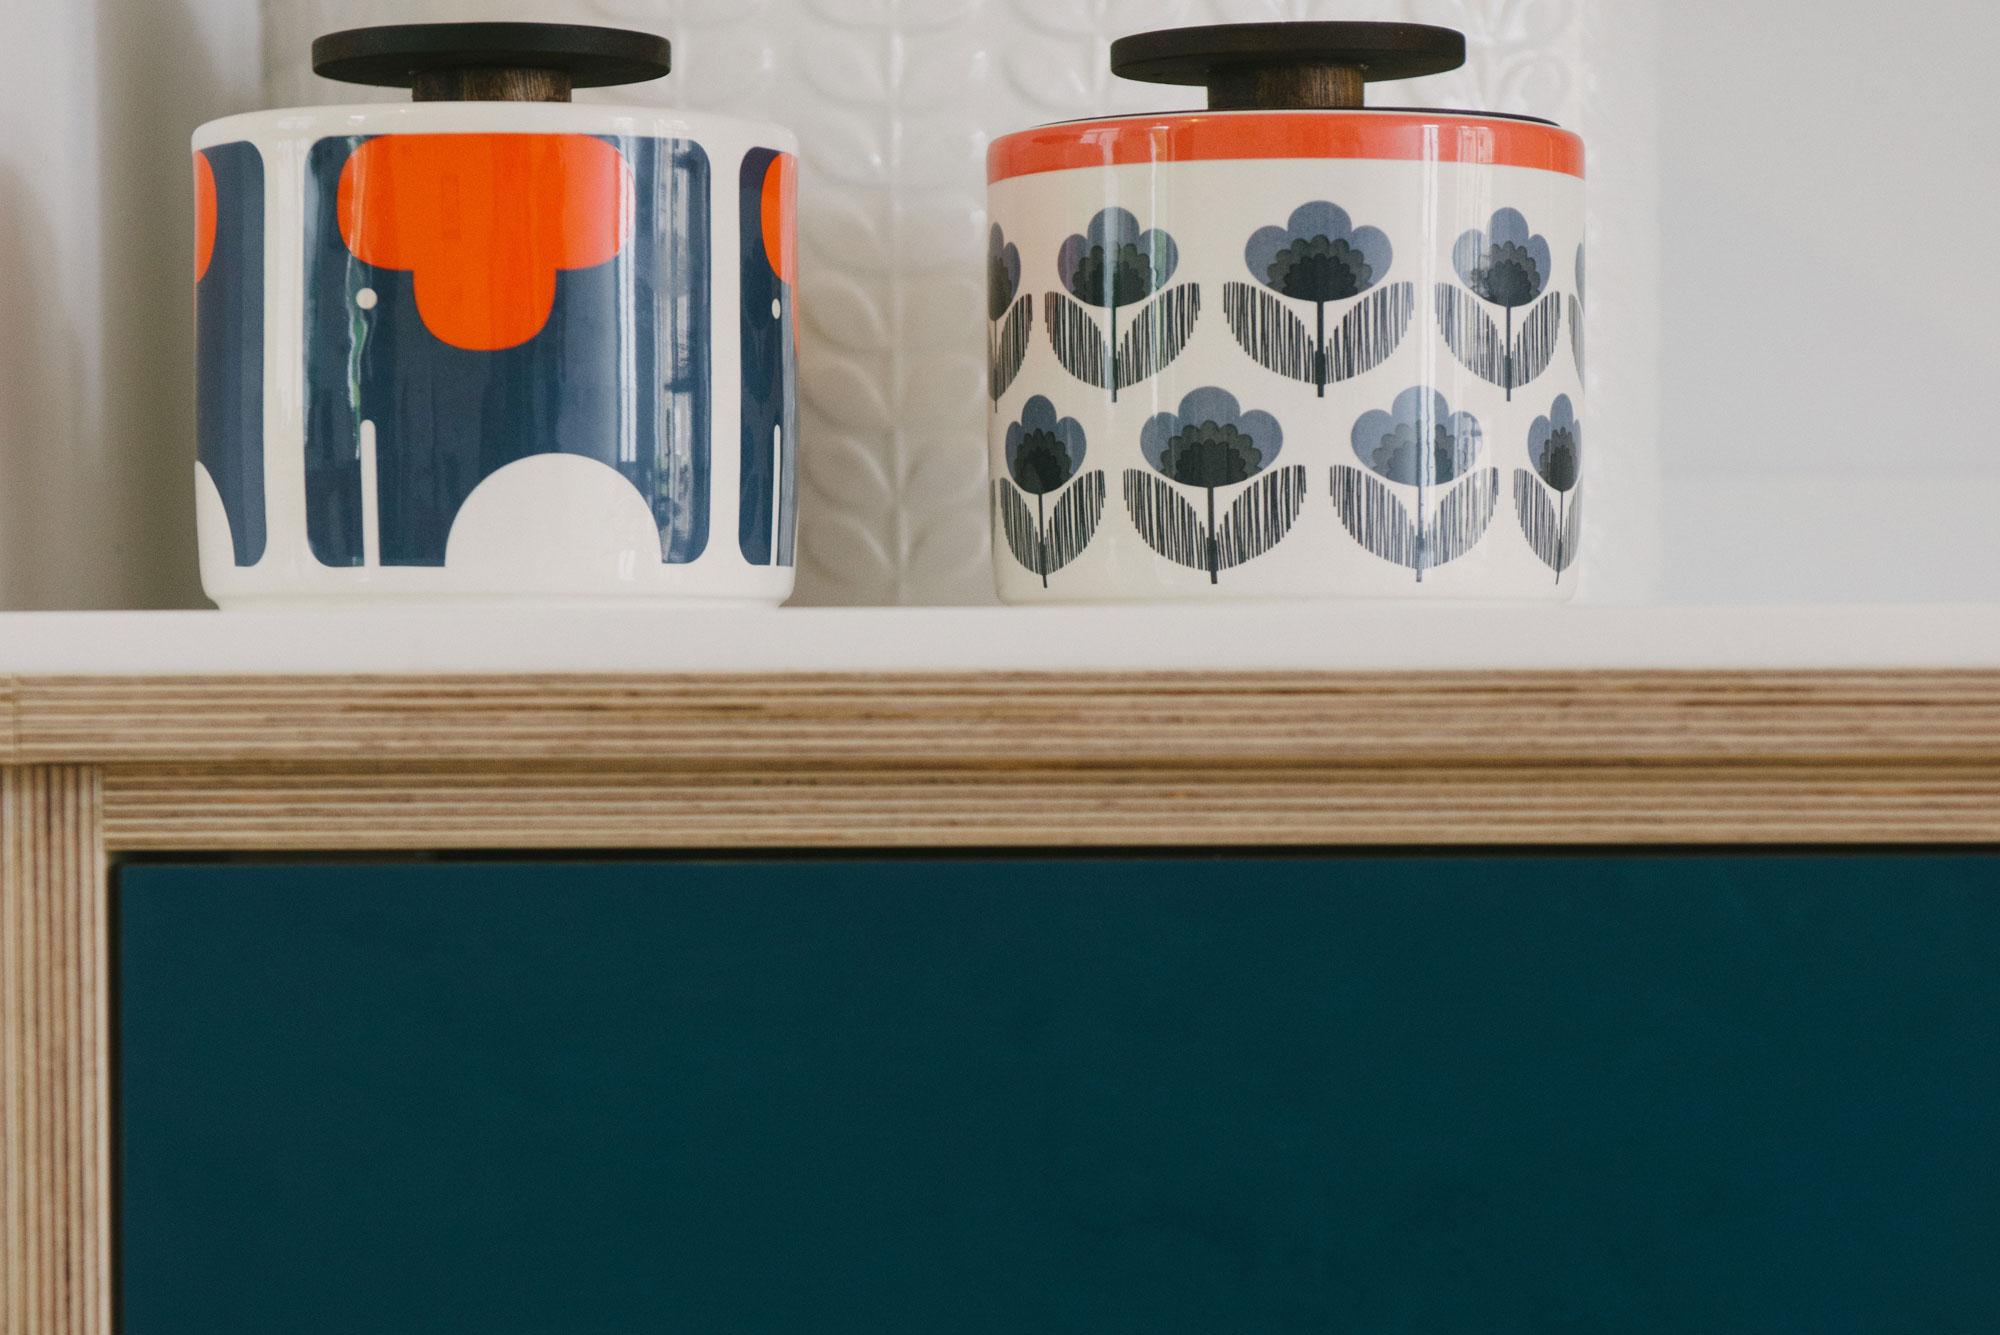 Storage Jars on corian worktop